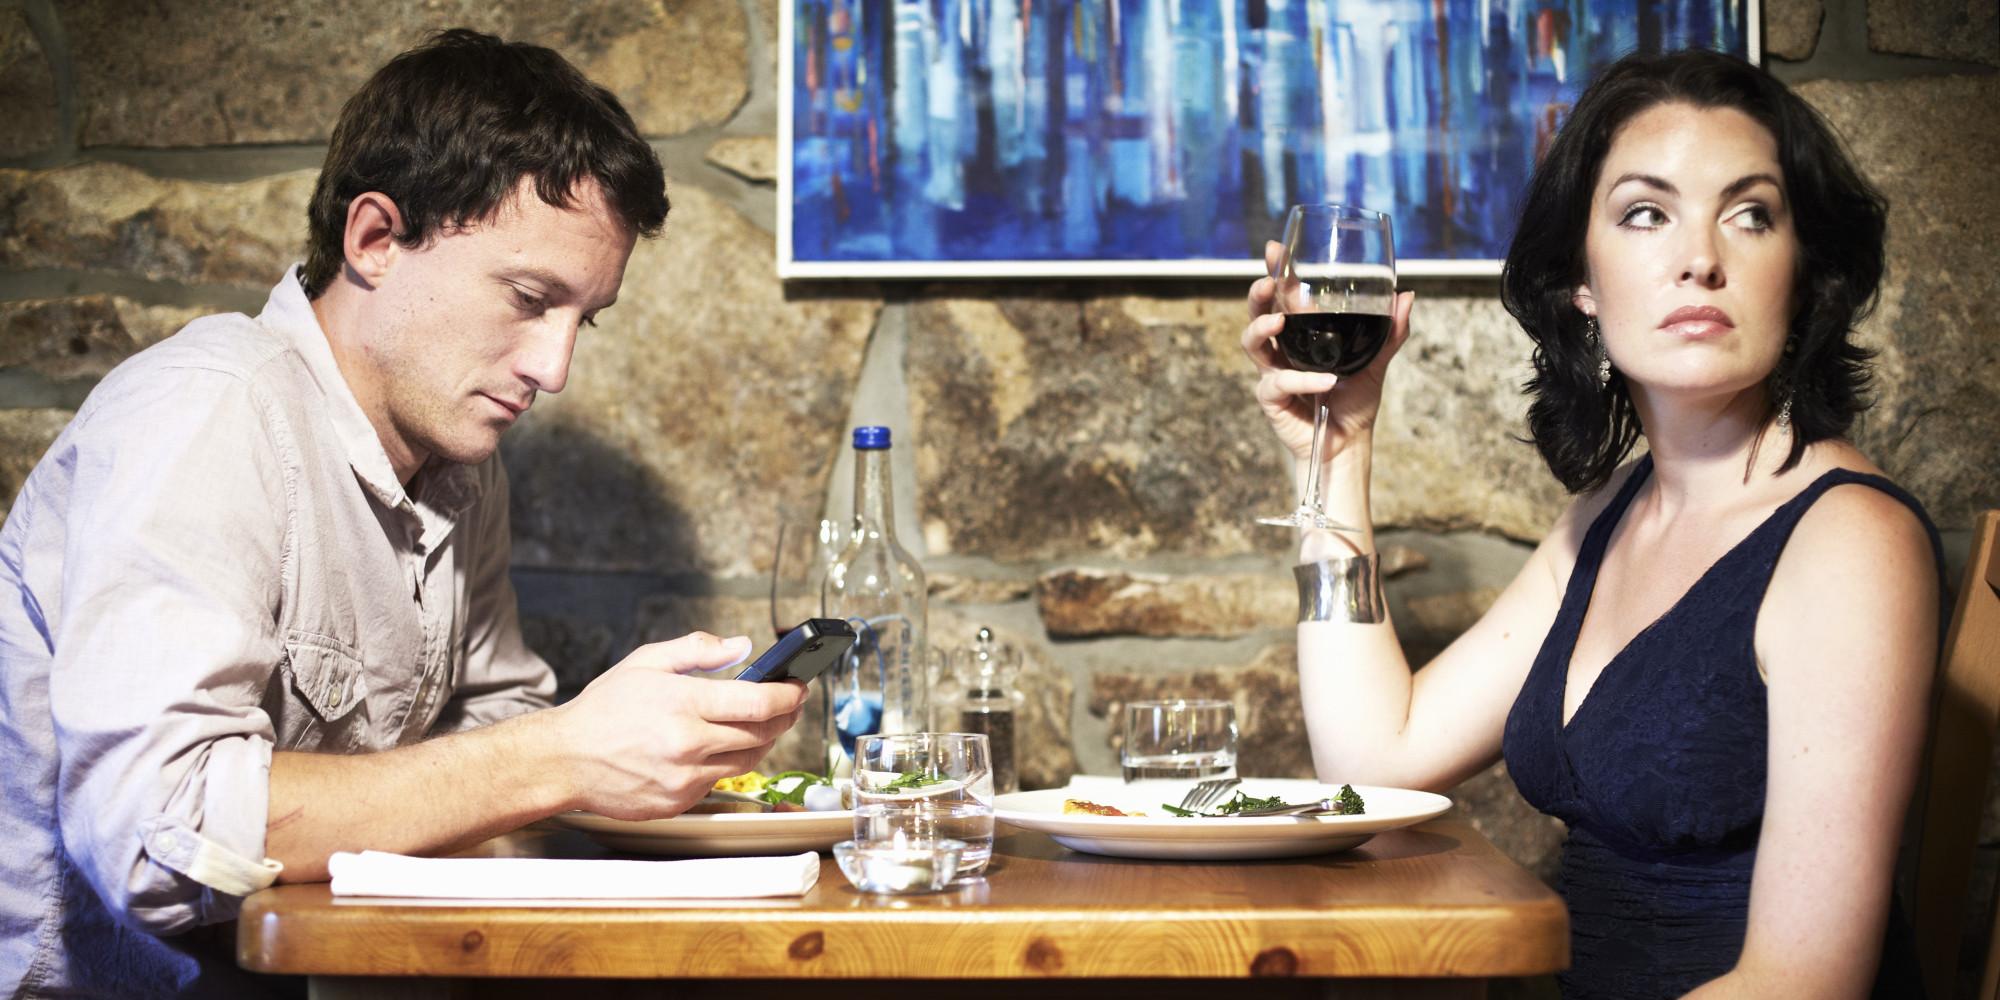 https://i0.wp.com/cdn.bgr.com/2014/07/smartphone-restaurant1.jpg